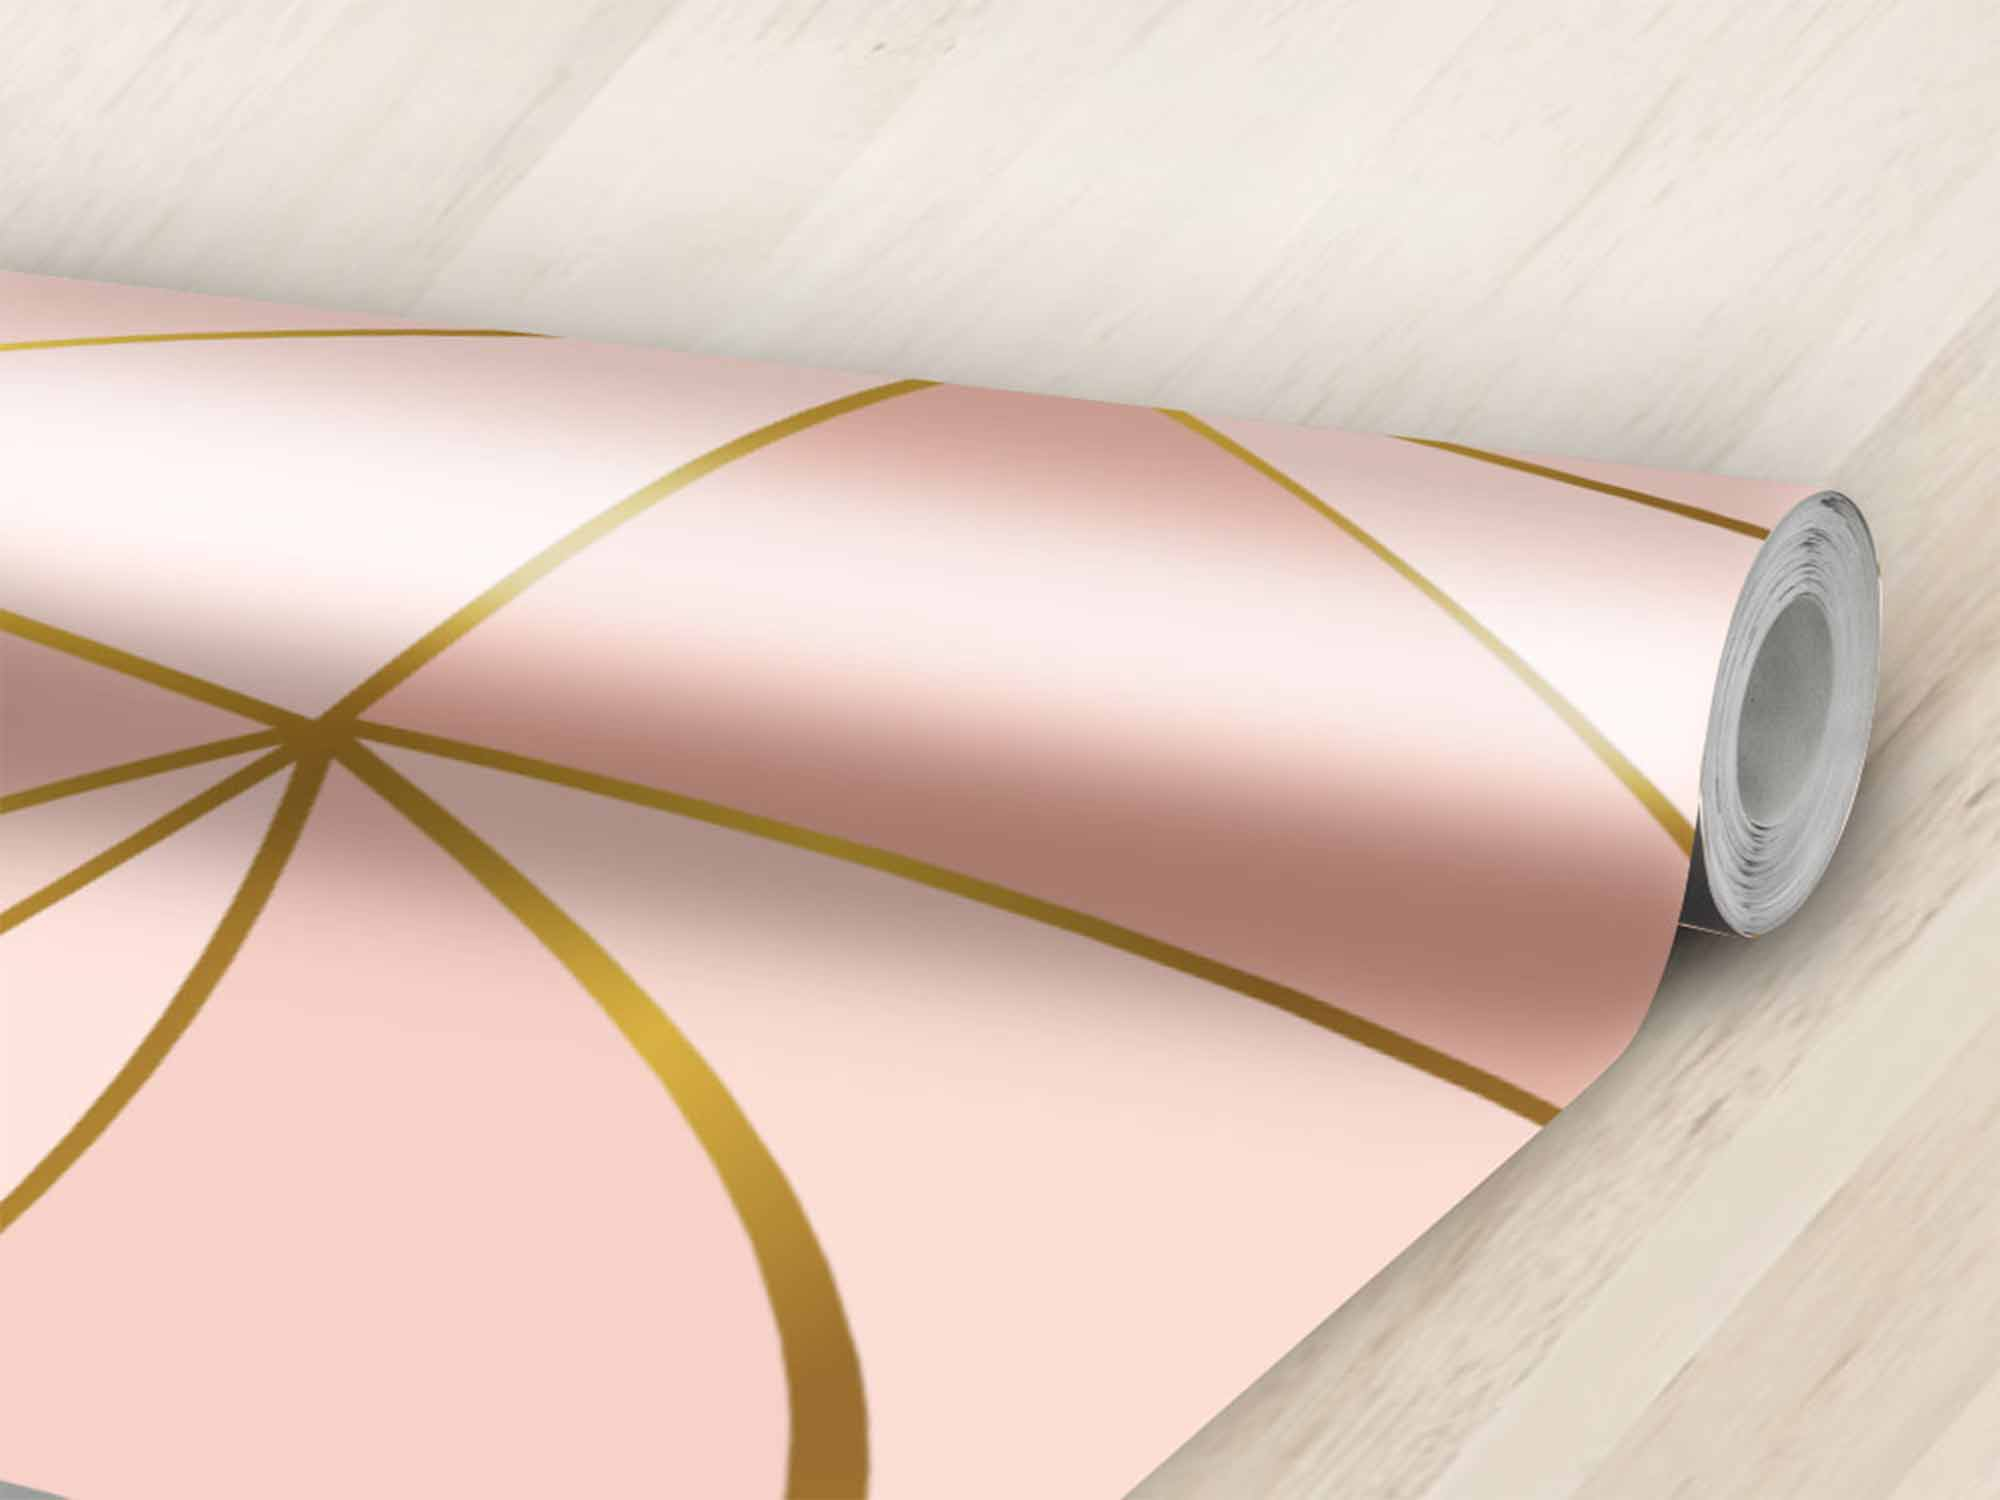 Papel de Parede Zara 0001- Adesivo de Parede  - Paredes Decoradas